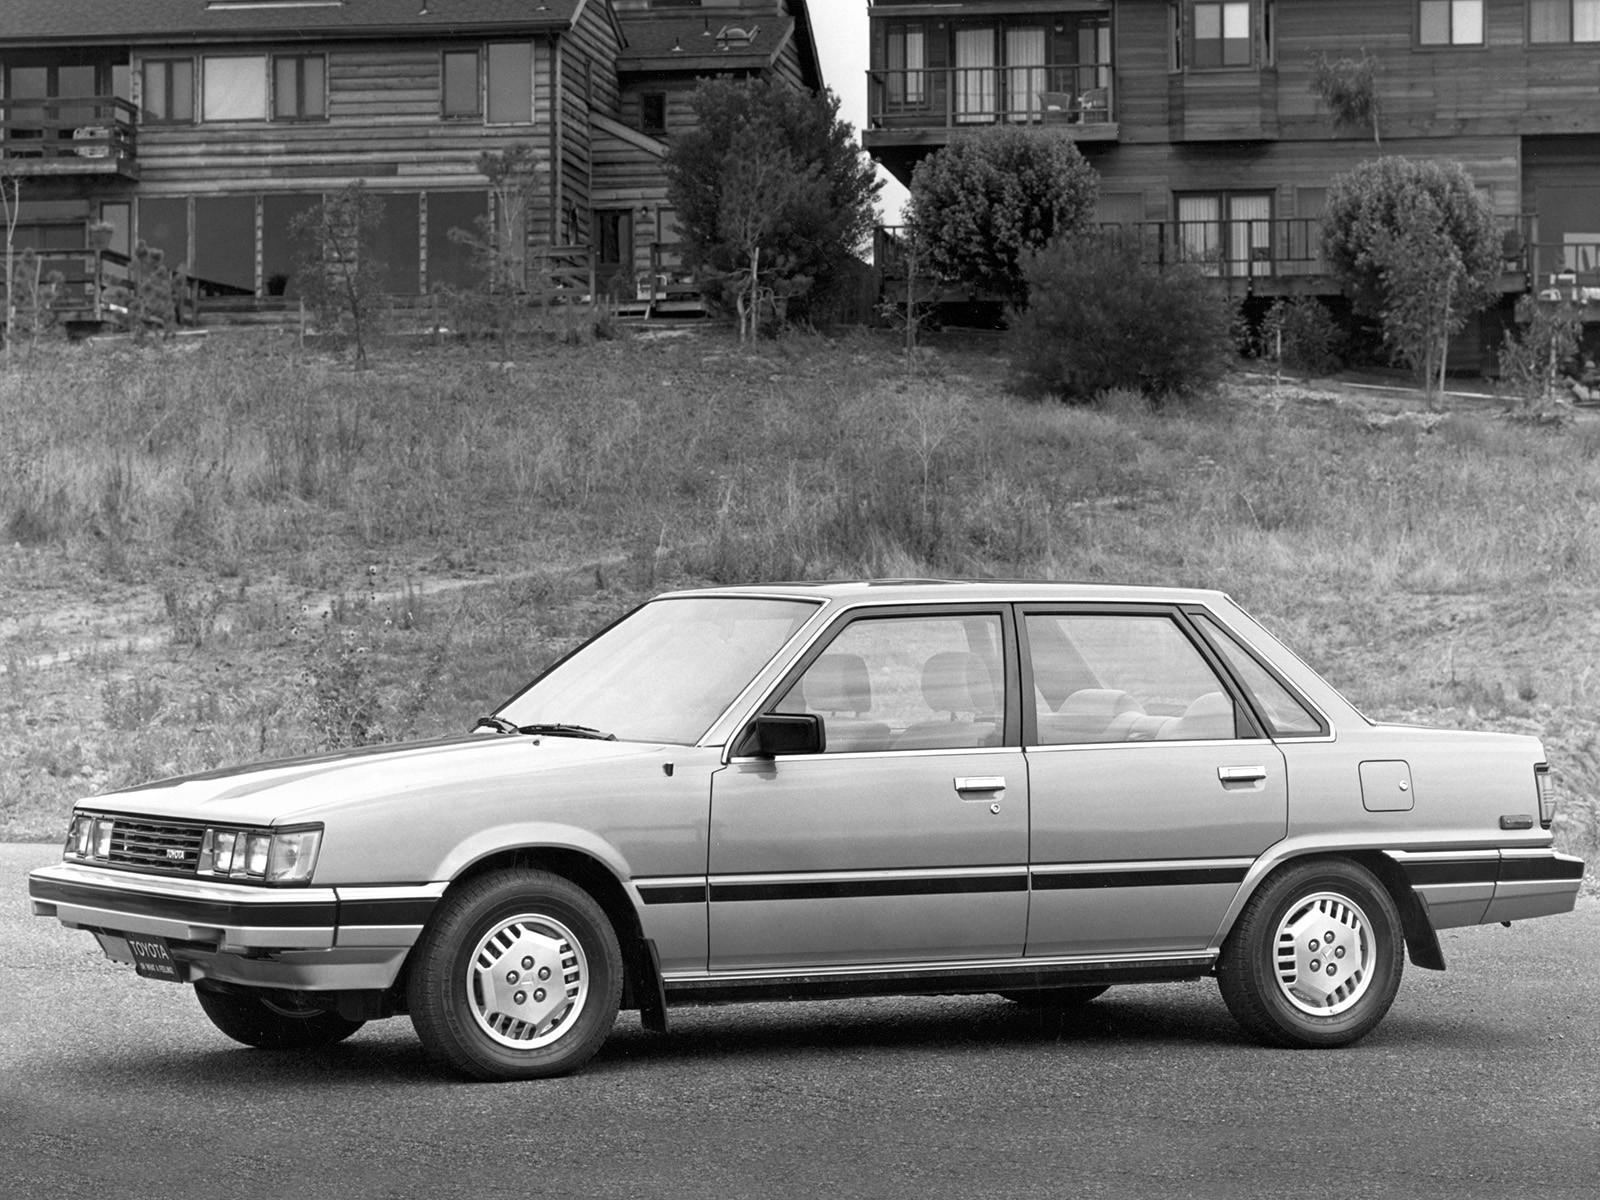 Toyota Camry Specs Photos 1983 1984 1985 1986 1987 Engine Diagram